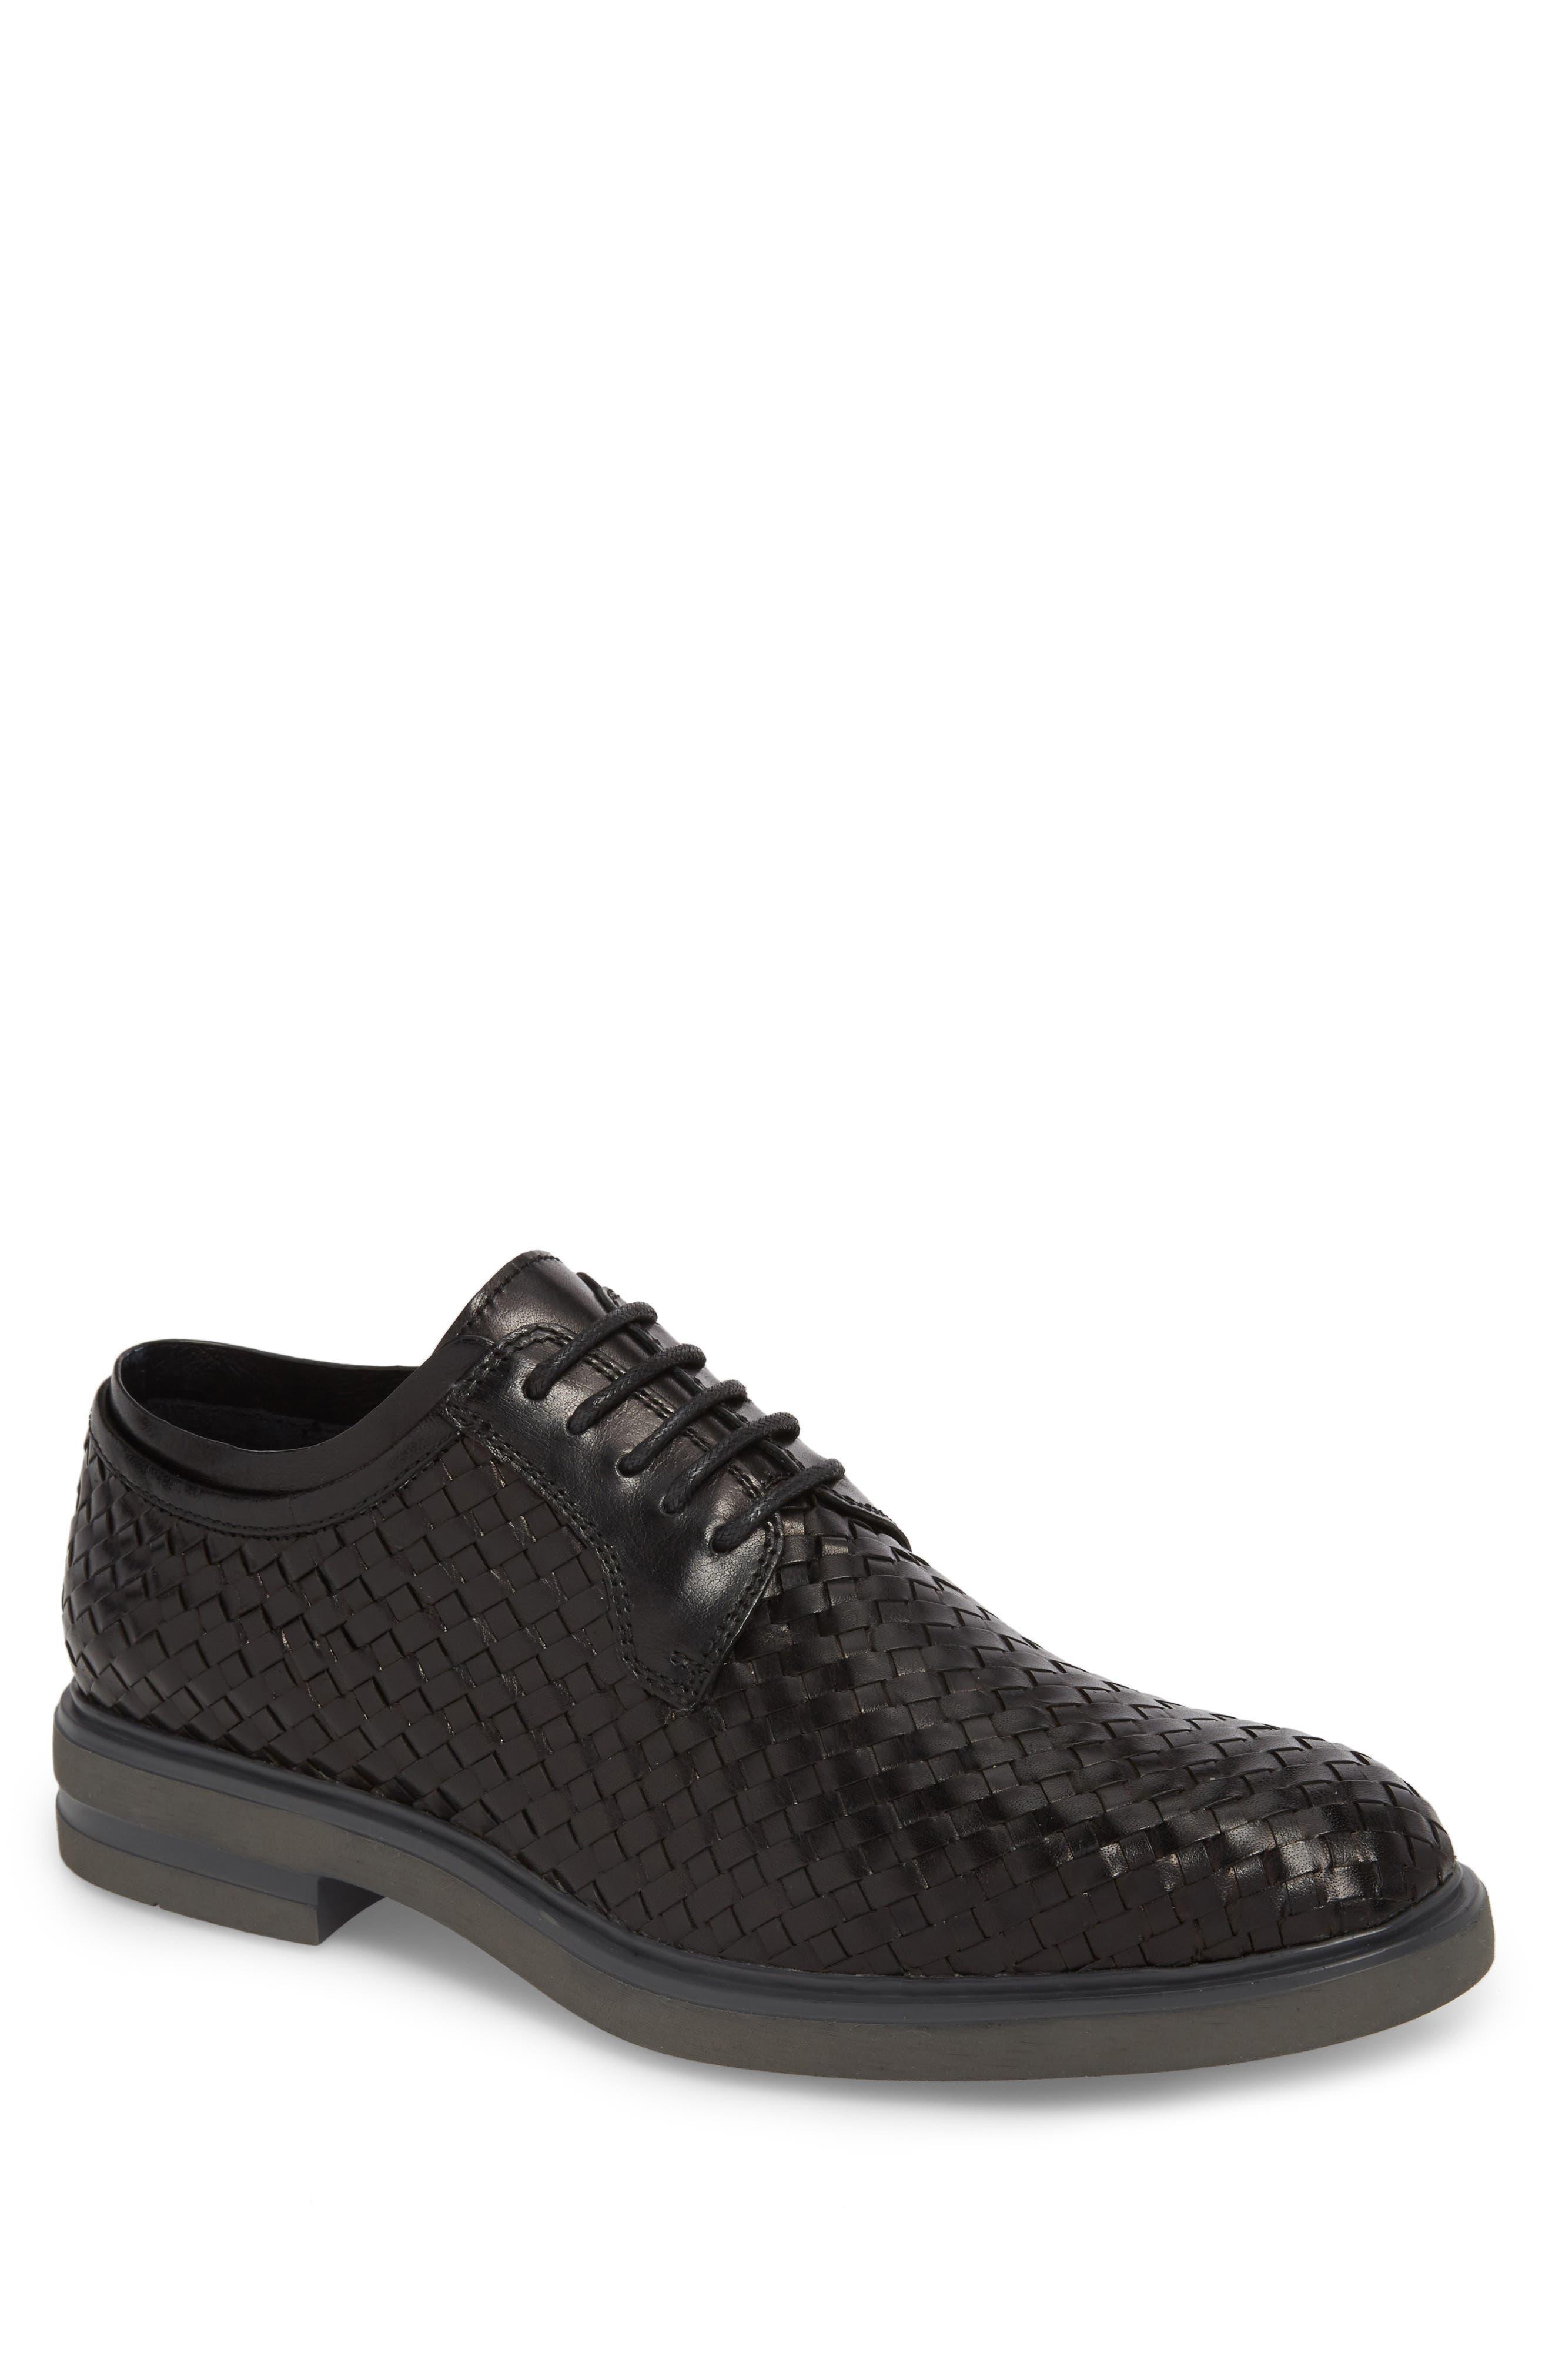 Eloi woven Derby,                         Main,                         color, Black Leather